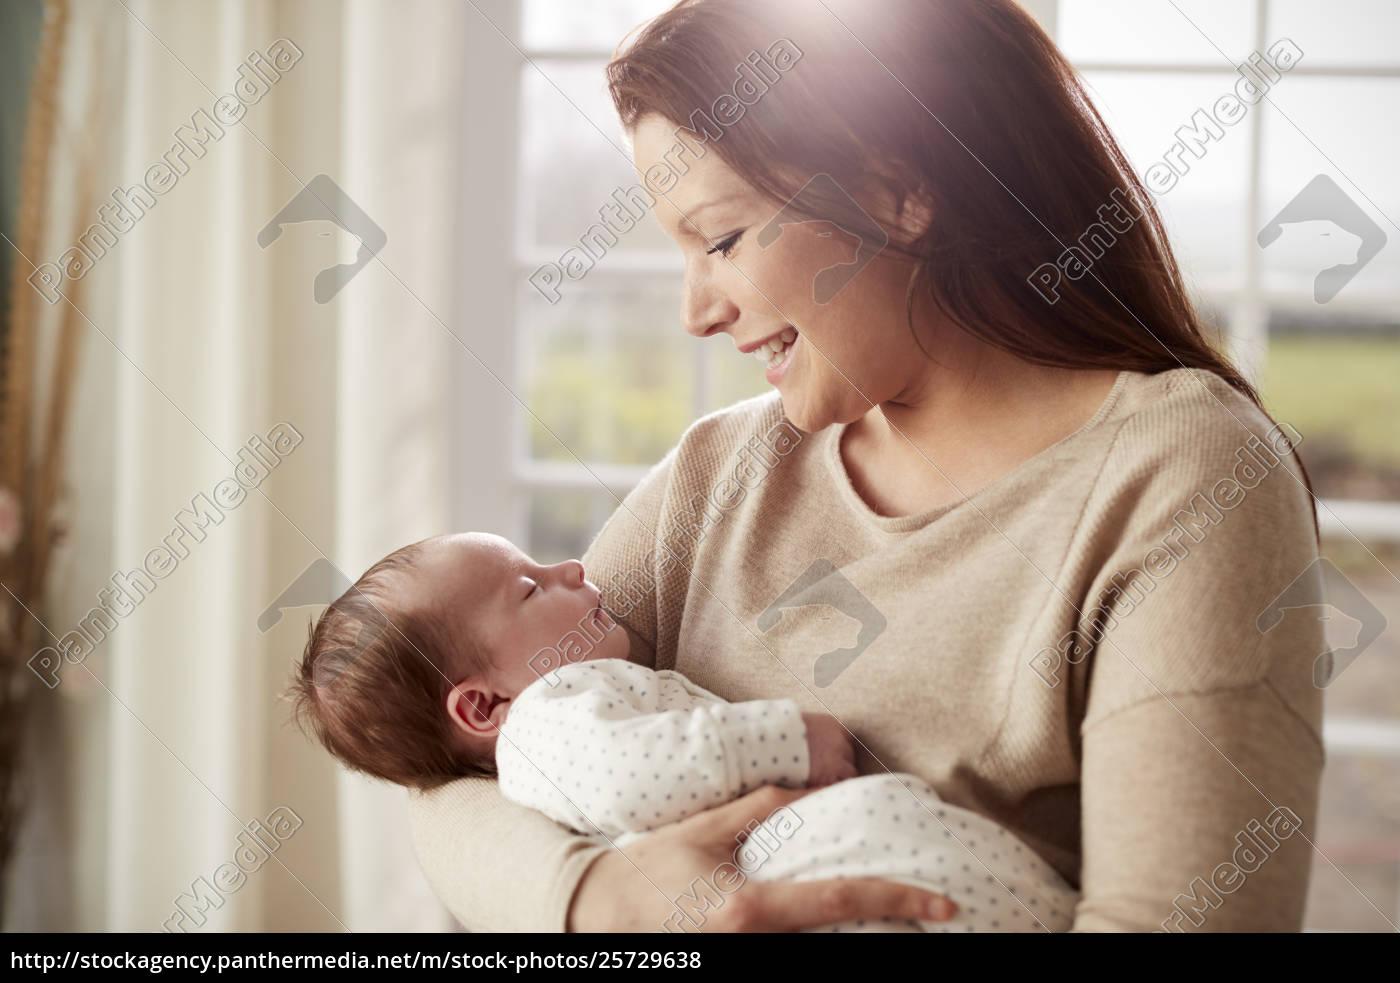 Royalty free image 25729638 loving mother cuddling newborn baby at home